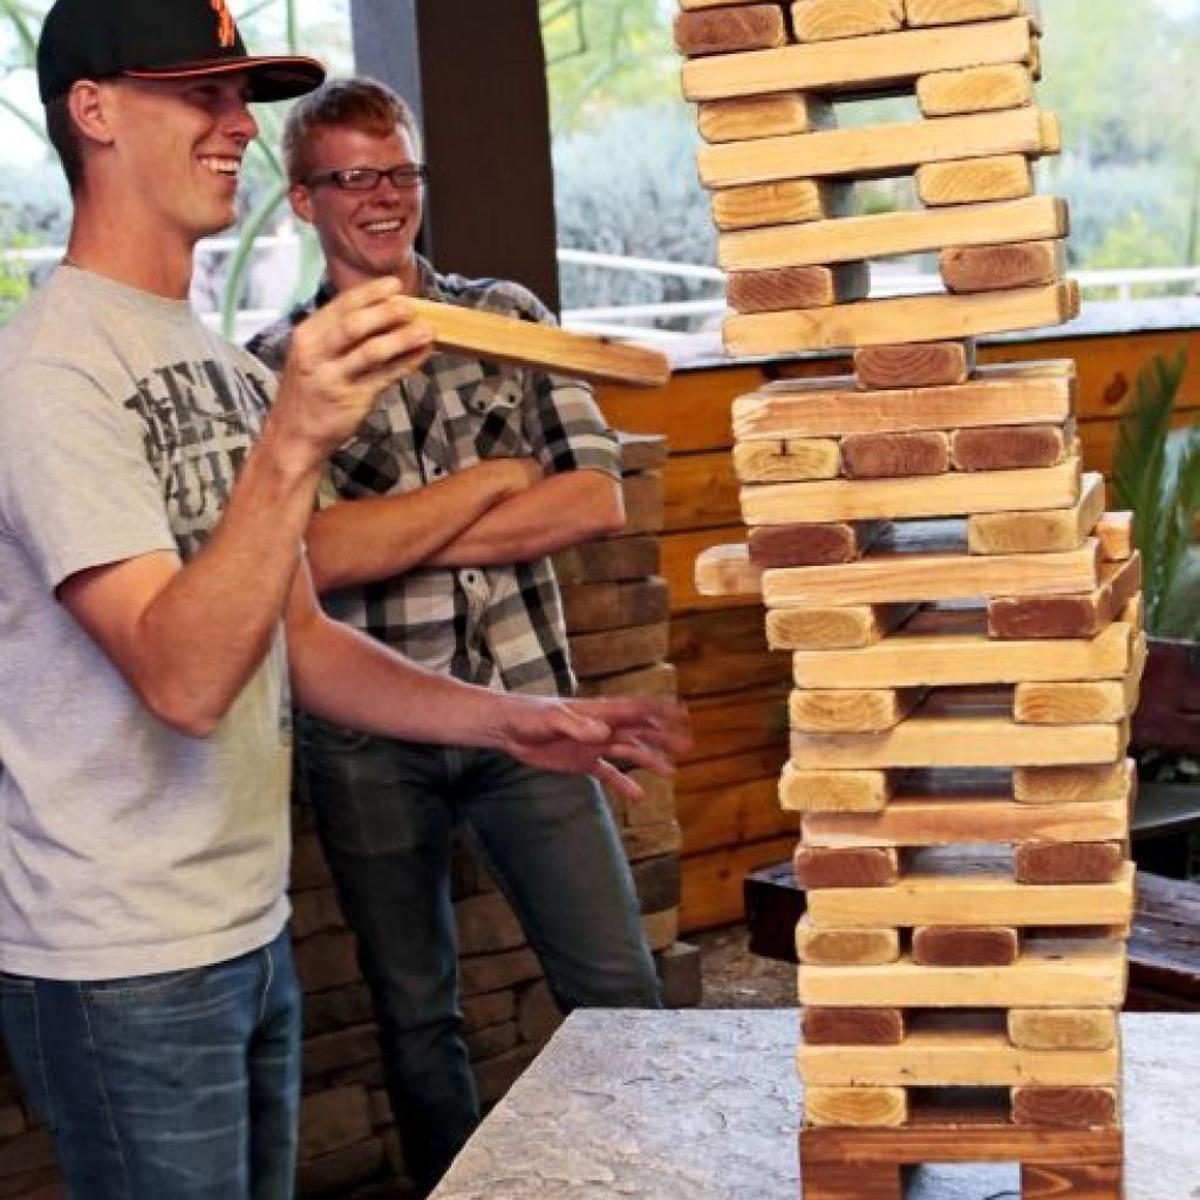 Makermania Gives Teens Free Stuff To Do Saturday Centsible Mom Tucson Com